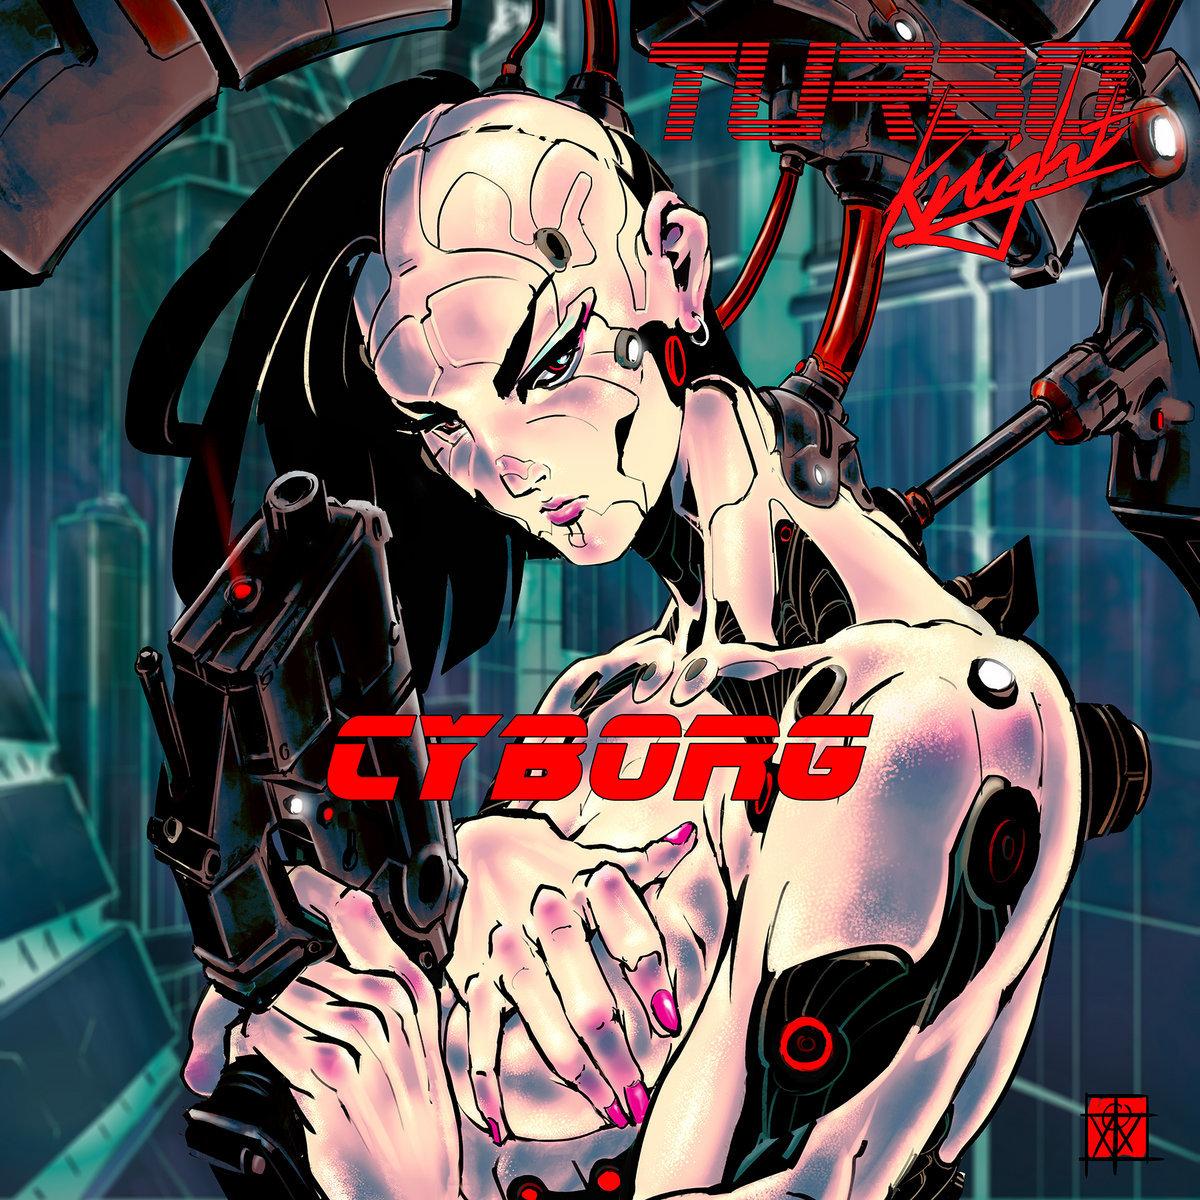 Turbo Knight, 'Cyborg Remixed'